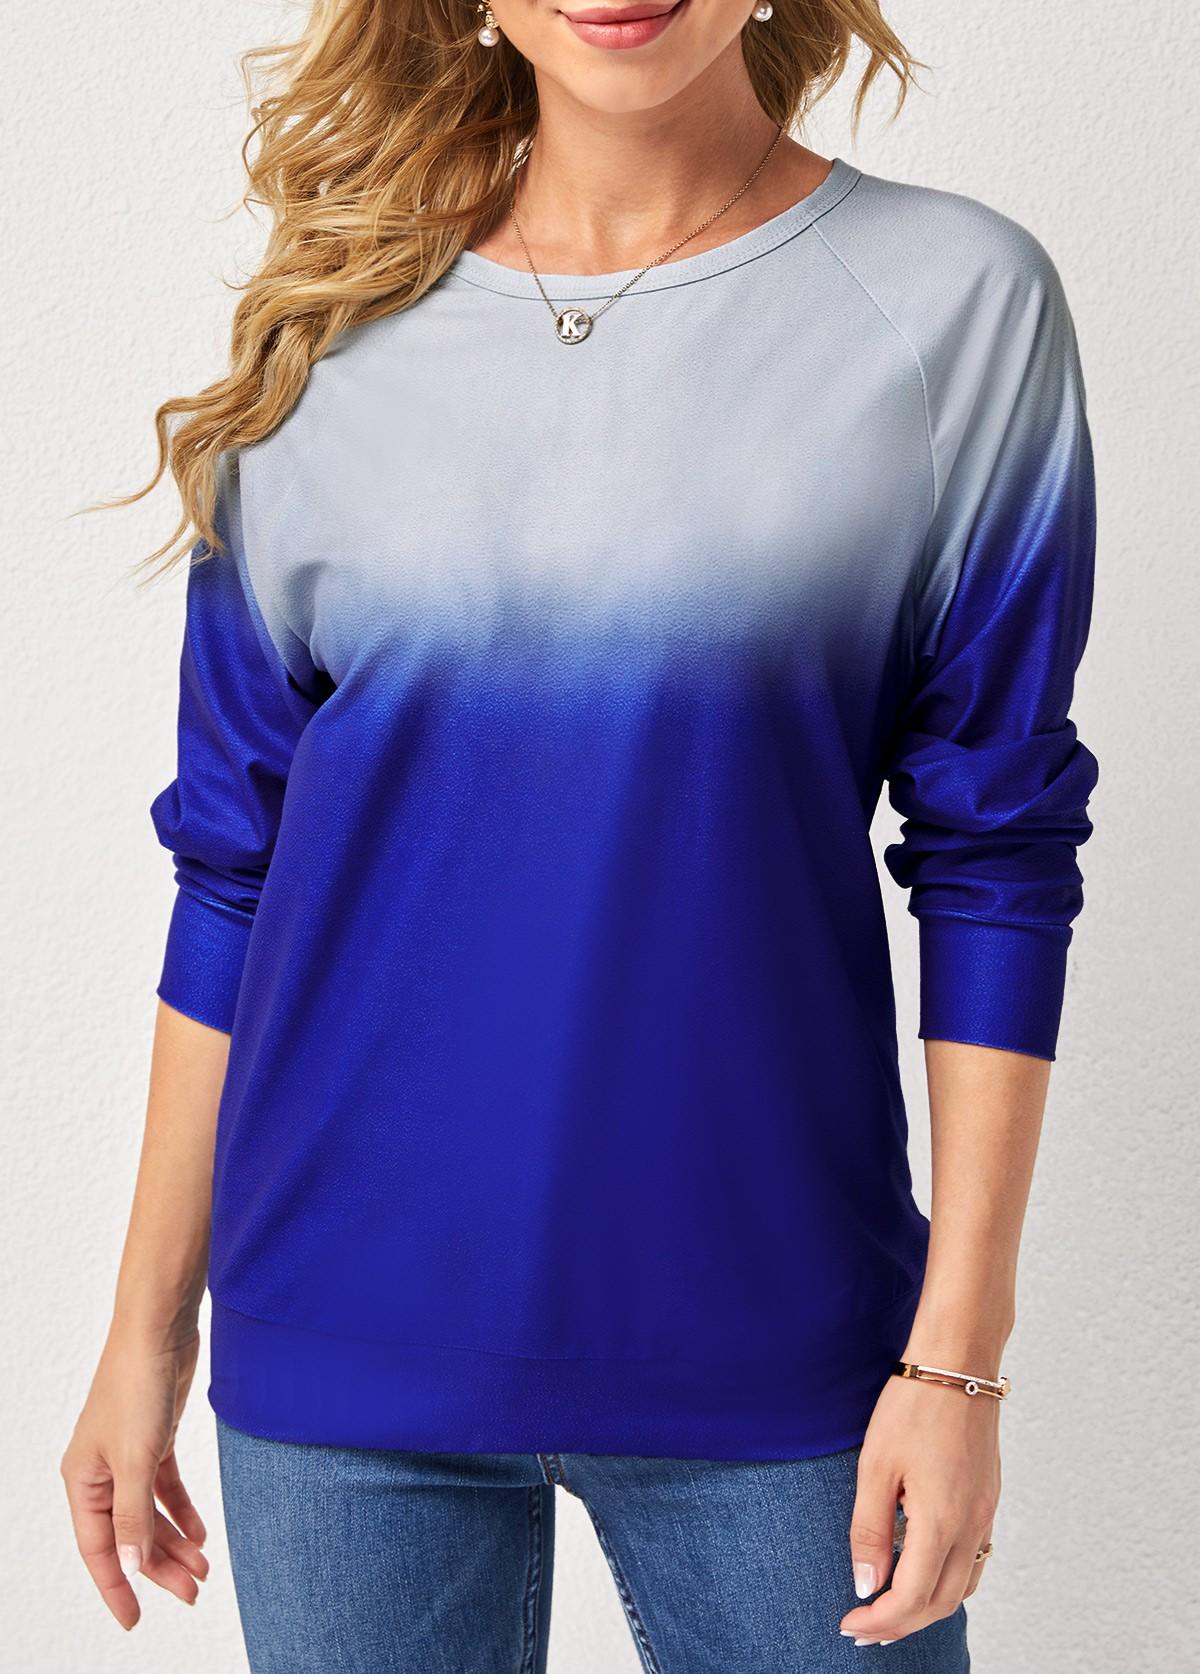 ROTITA Ombre Print Round Neck Long Sleeve Sweatshirt